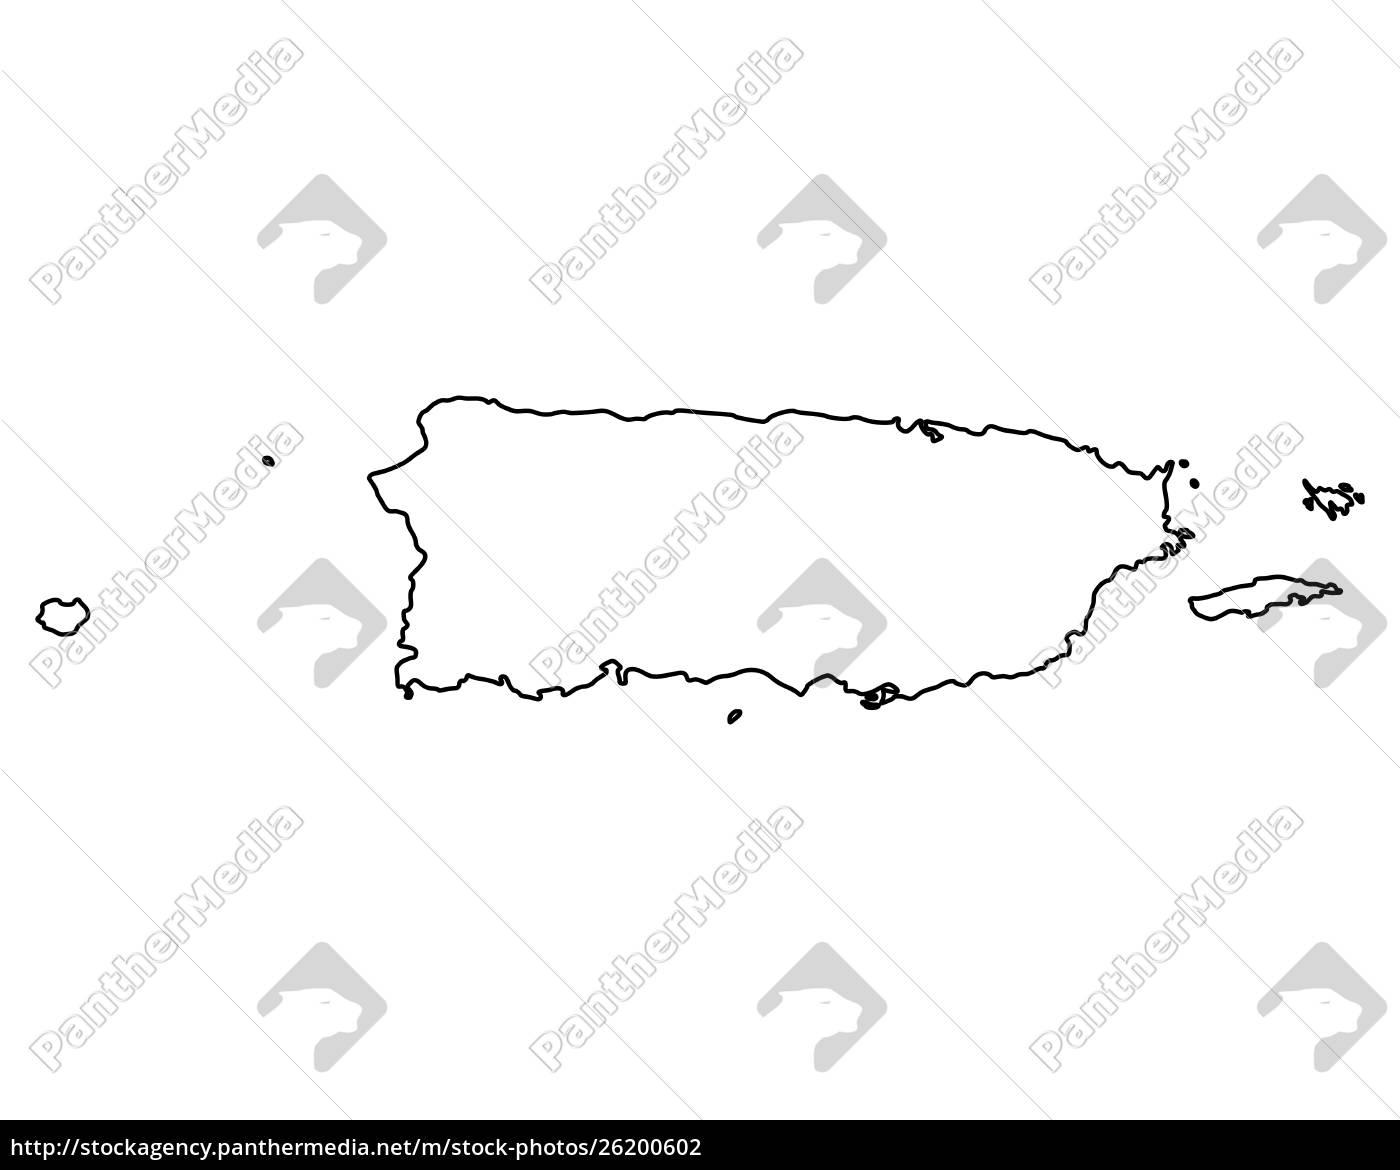 Kort Over Puerto Rico Stockphoto 26200602 Panthermedia